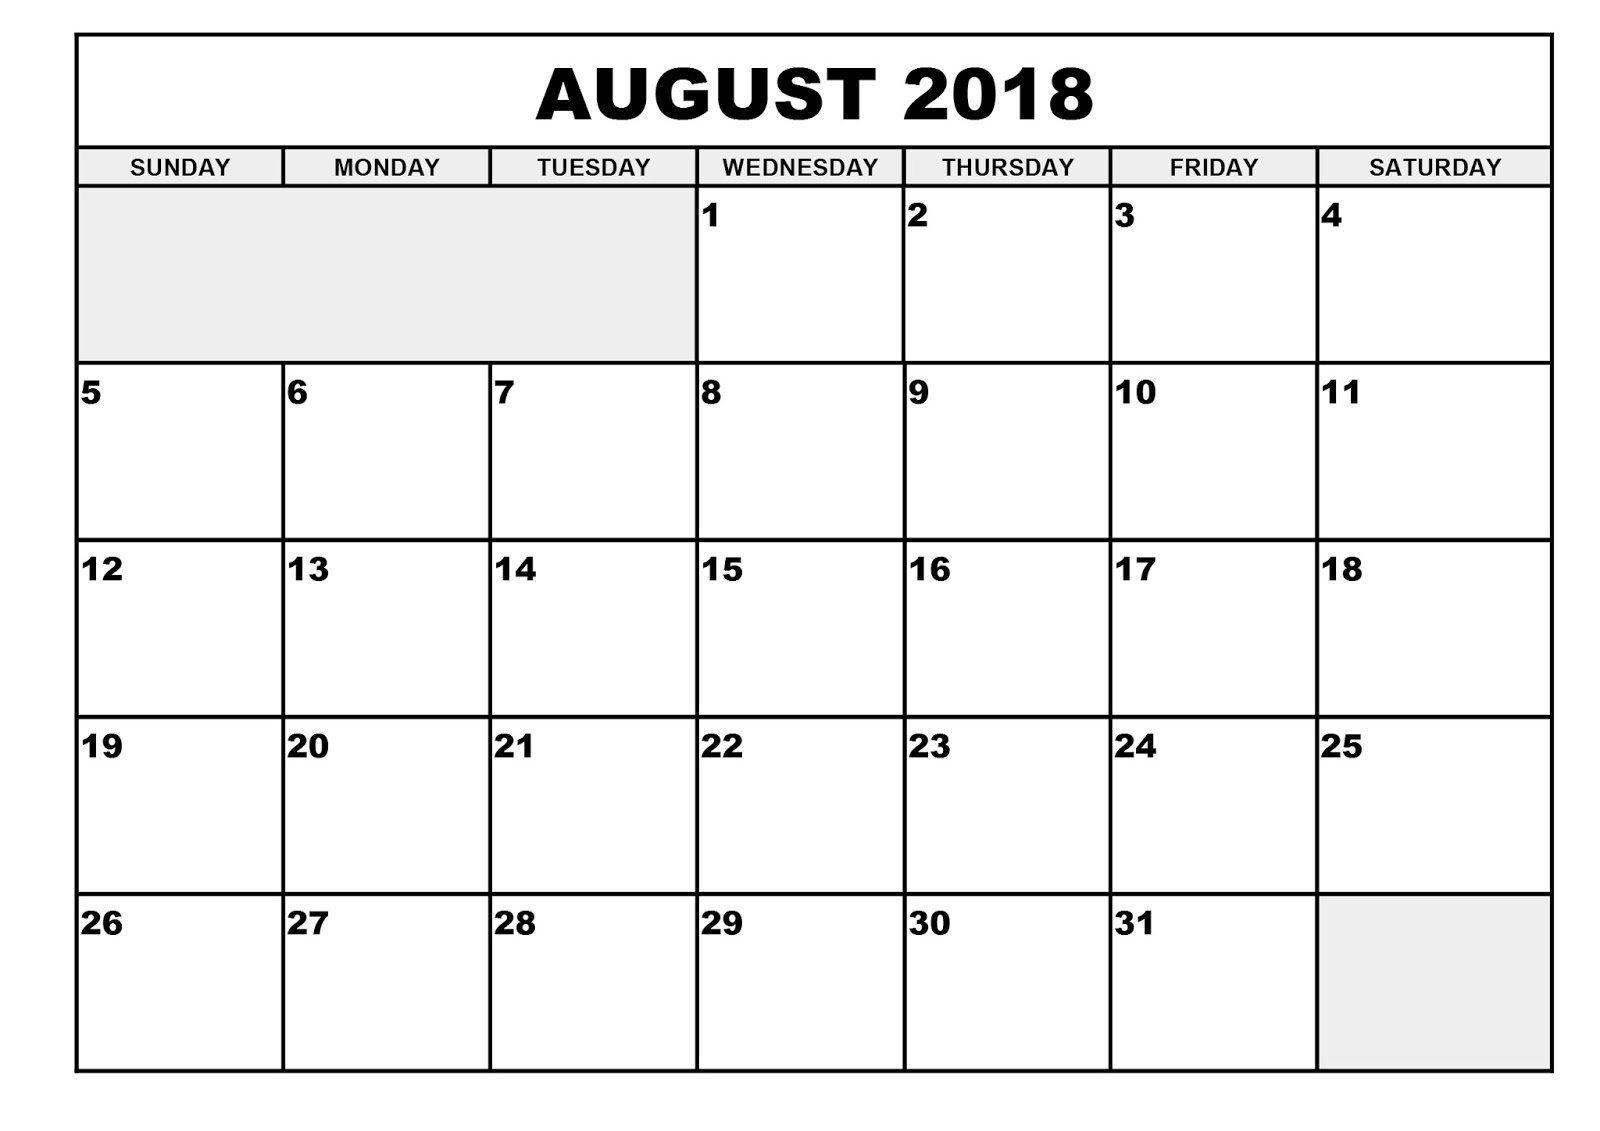 printable month calendar calendar pro Printable Monthly Calendar For Aug 2018 erdferdf